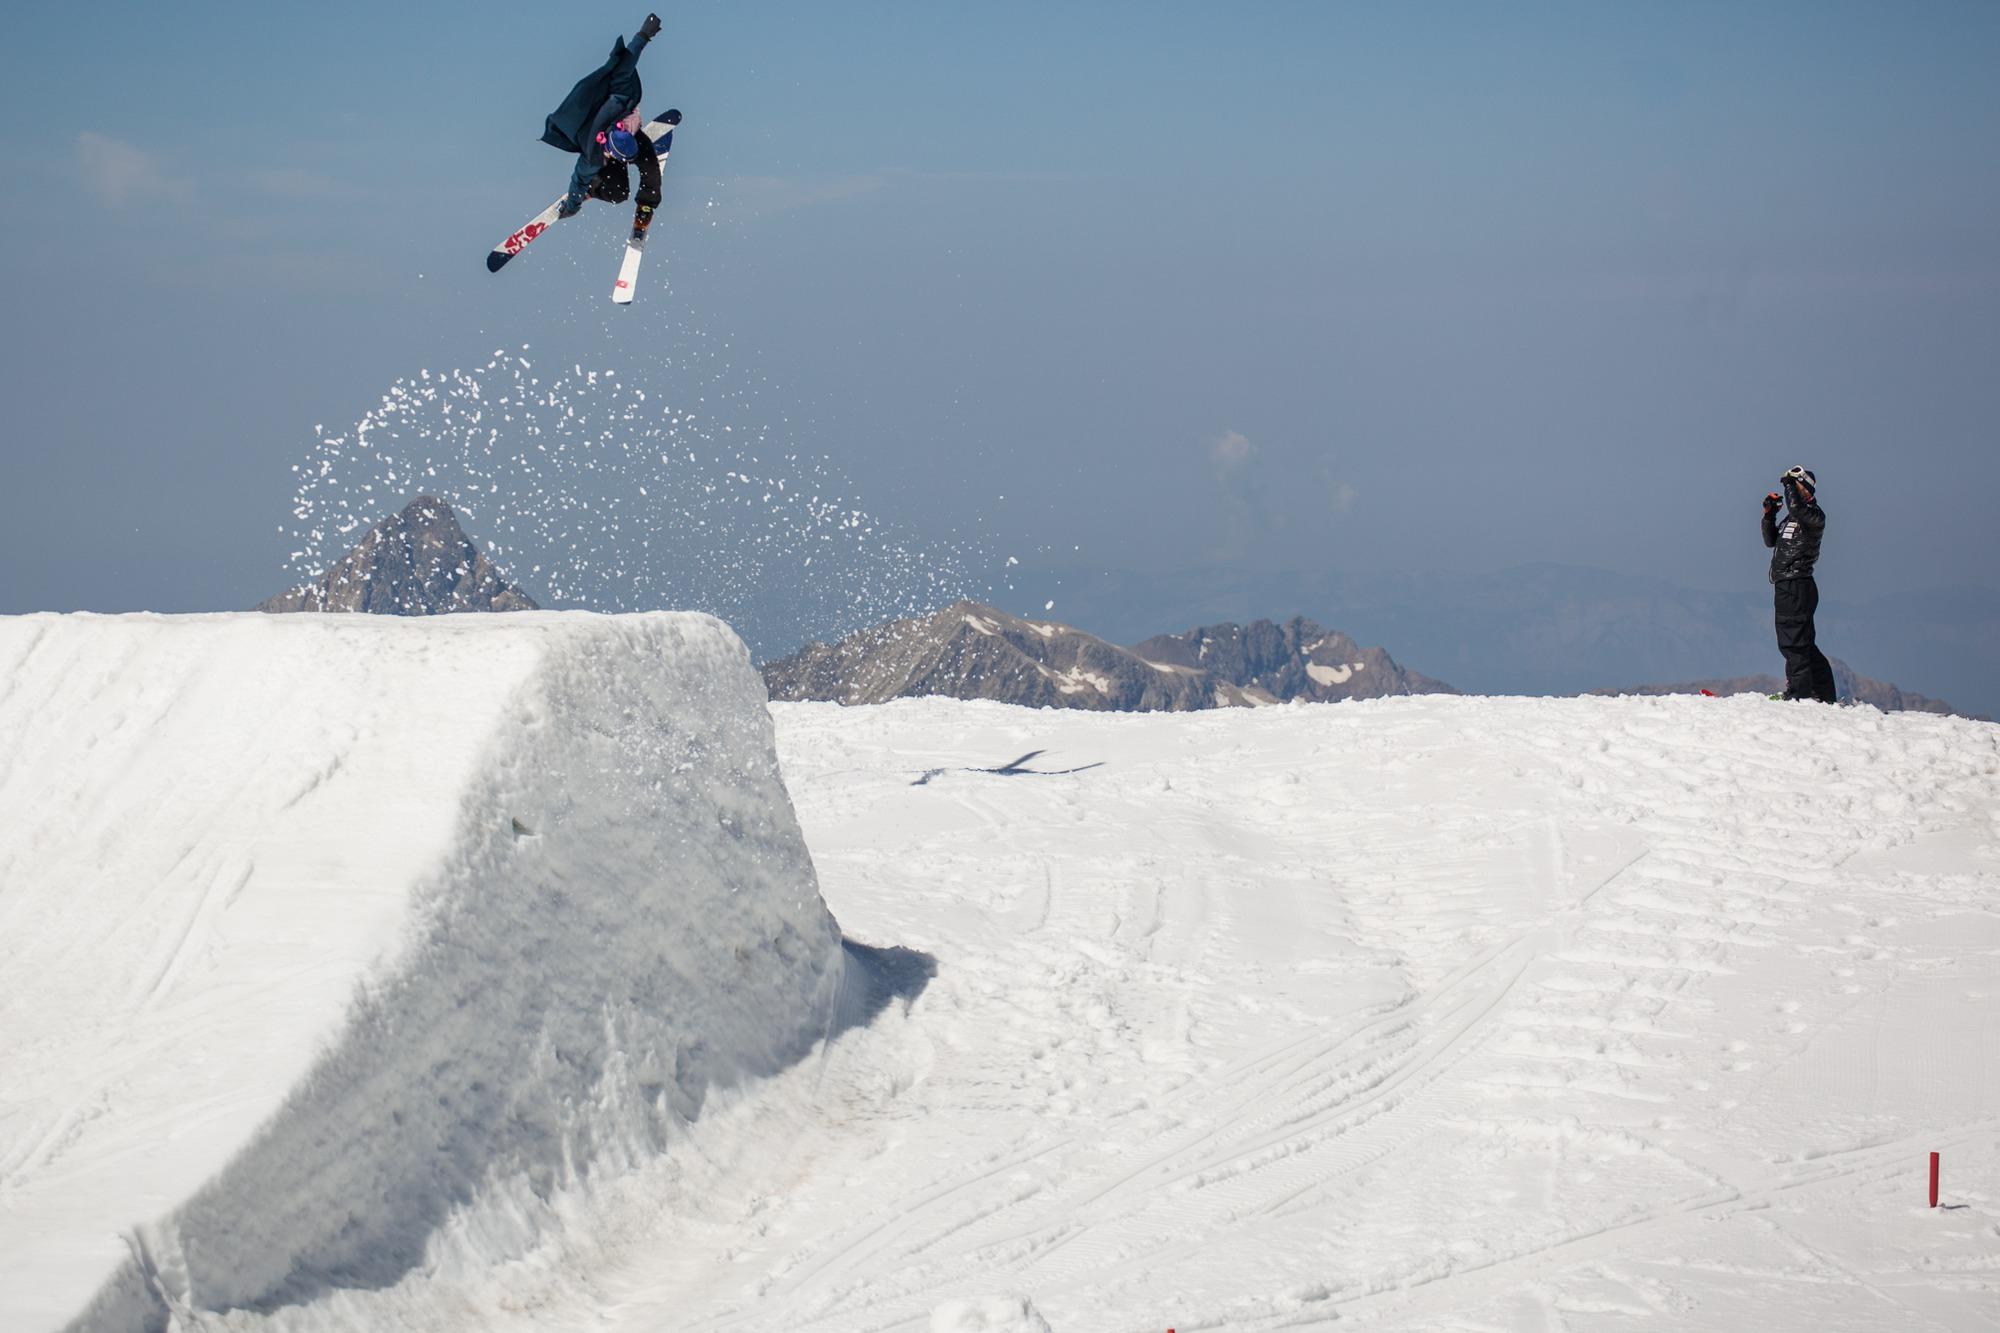 skipass.com - ski et snowboard freeride & freestyle - Stations de ski - webcams